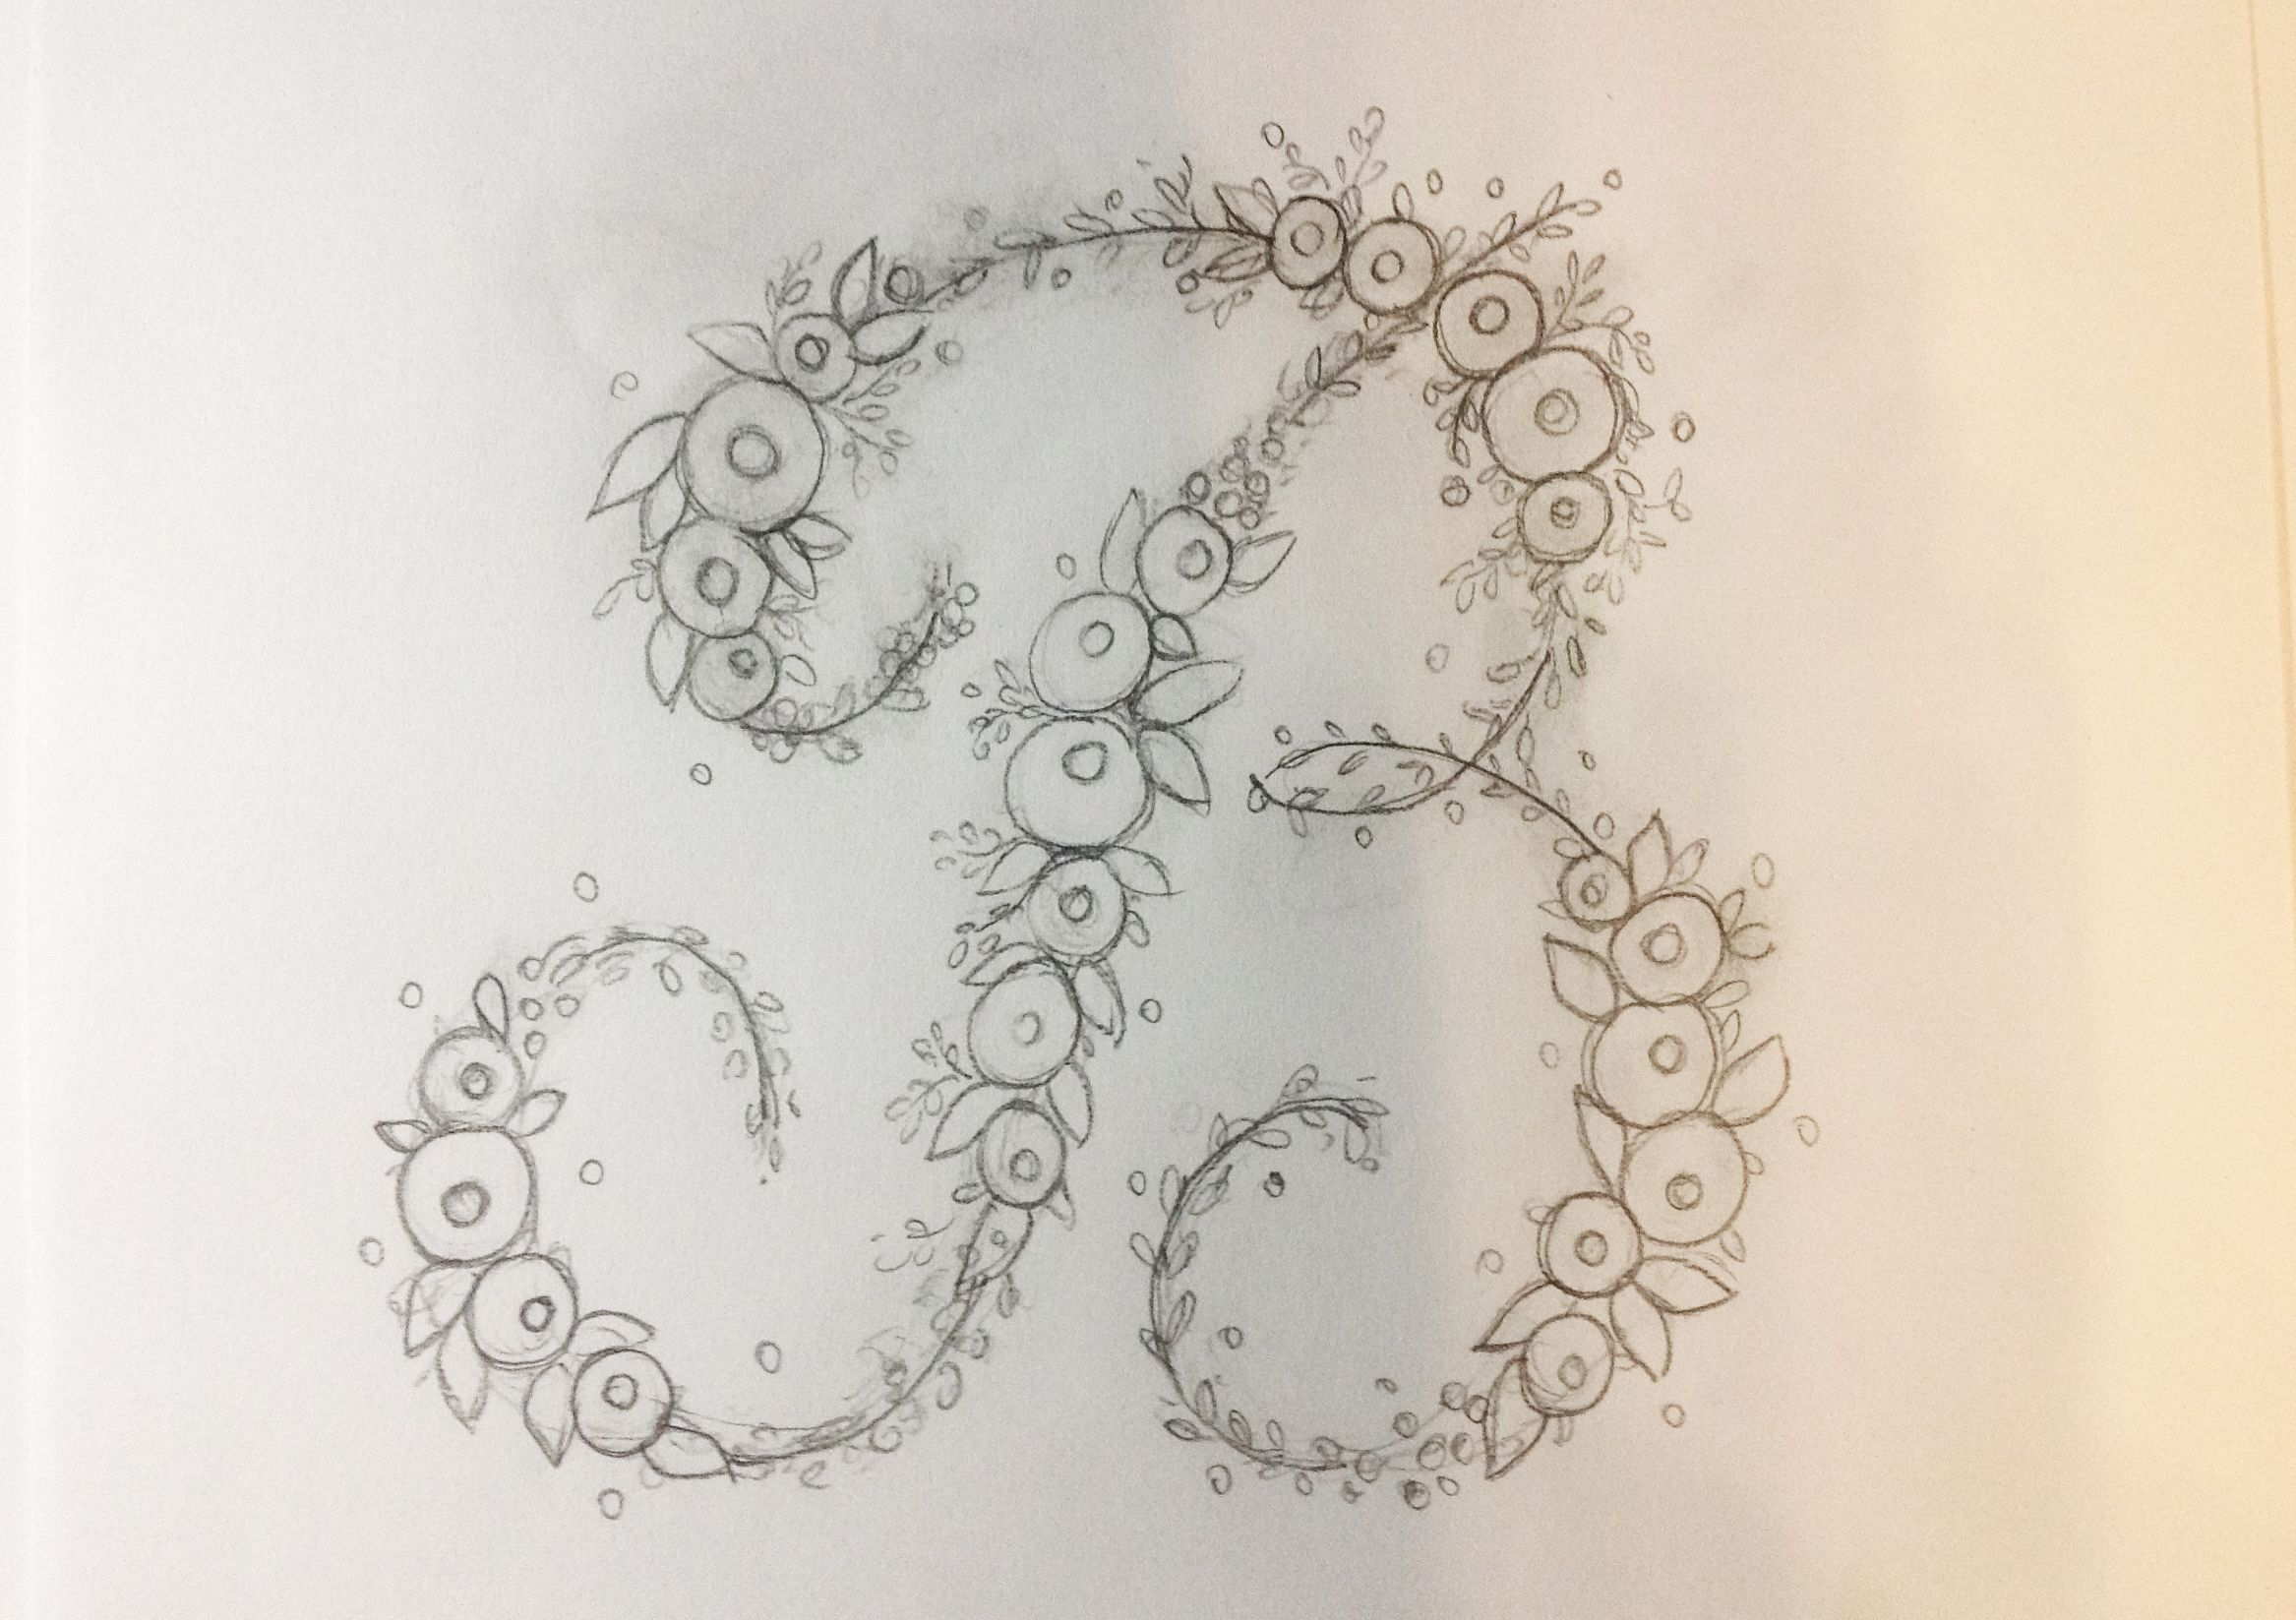 Pin by bubble santani on Embroidery | Pinterest | Bordado, Bordar ...